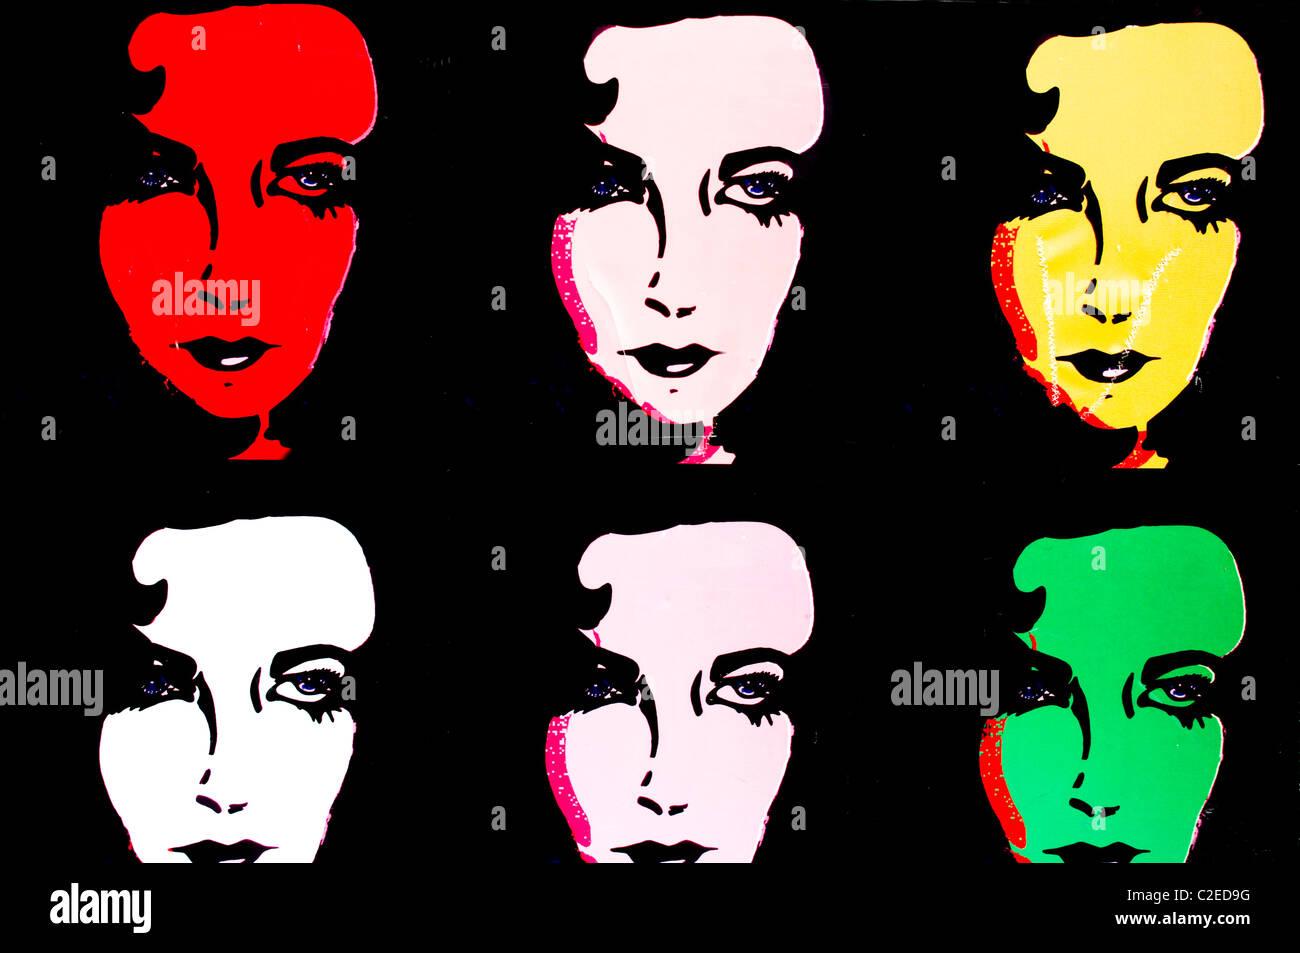 Images of Elizabeth Taylor portrayed in Andy Worhol pop art style. It is a street art image found in Amman, Jordan. - Stock Image